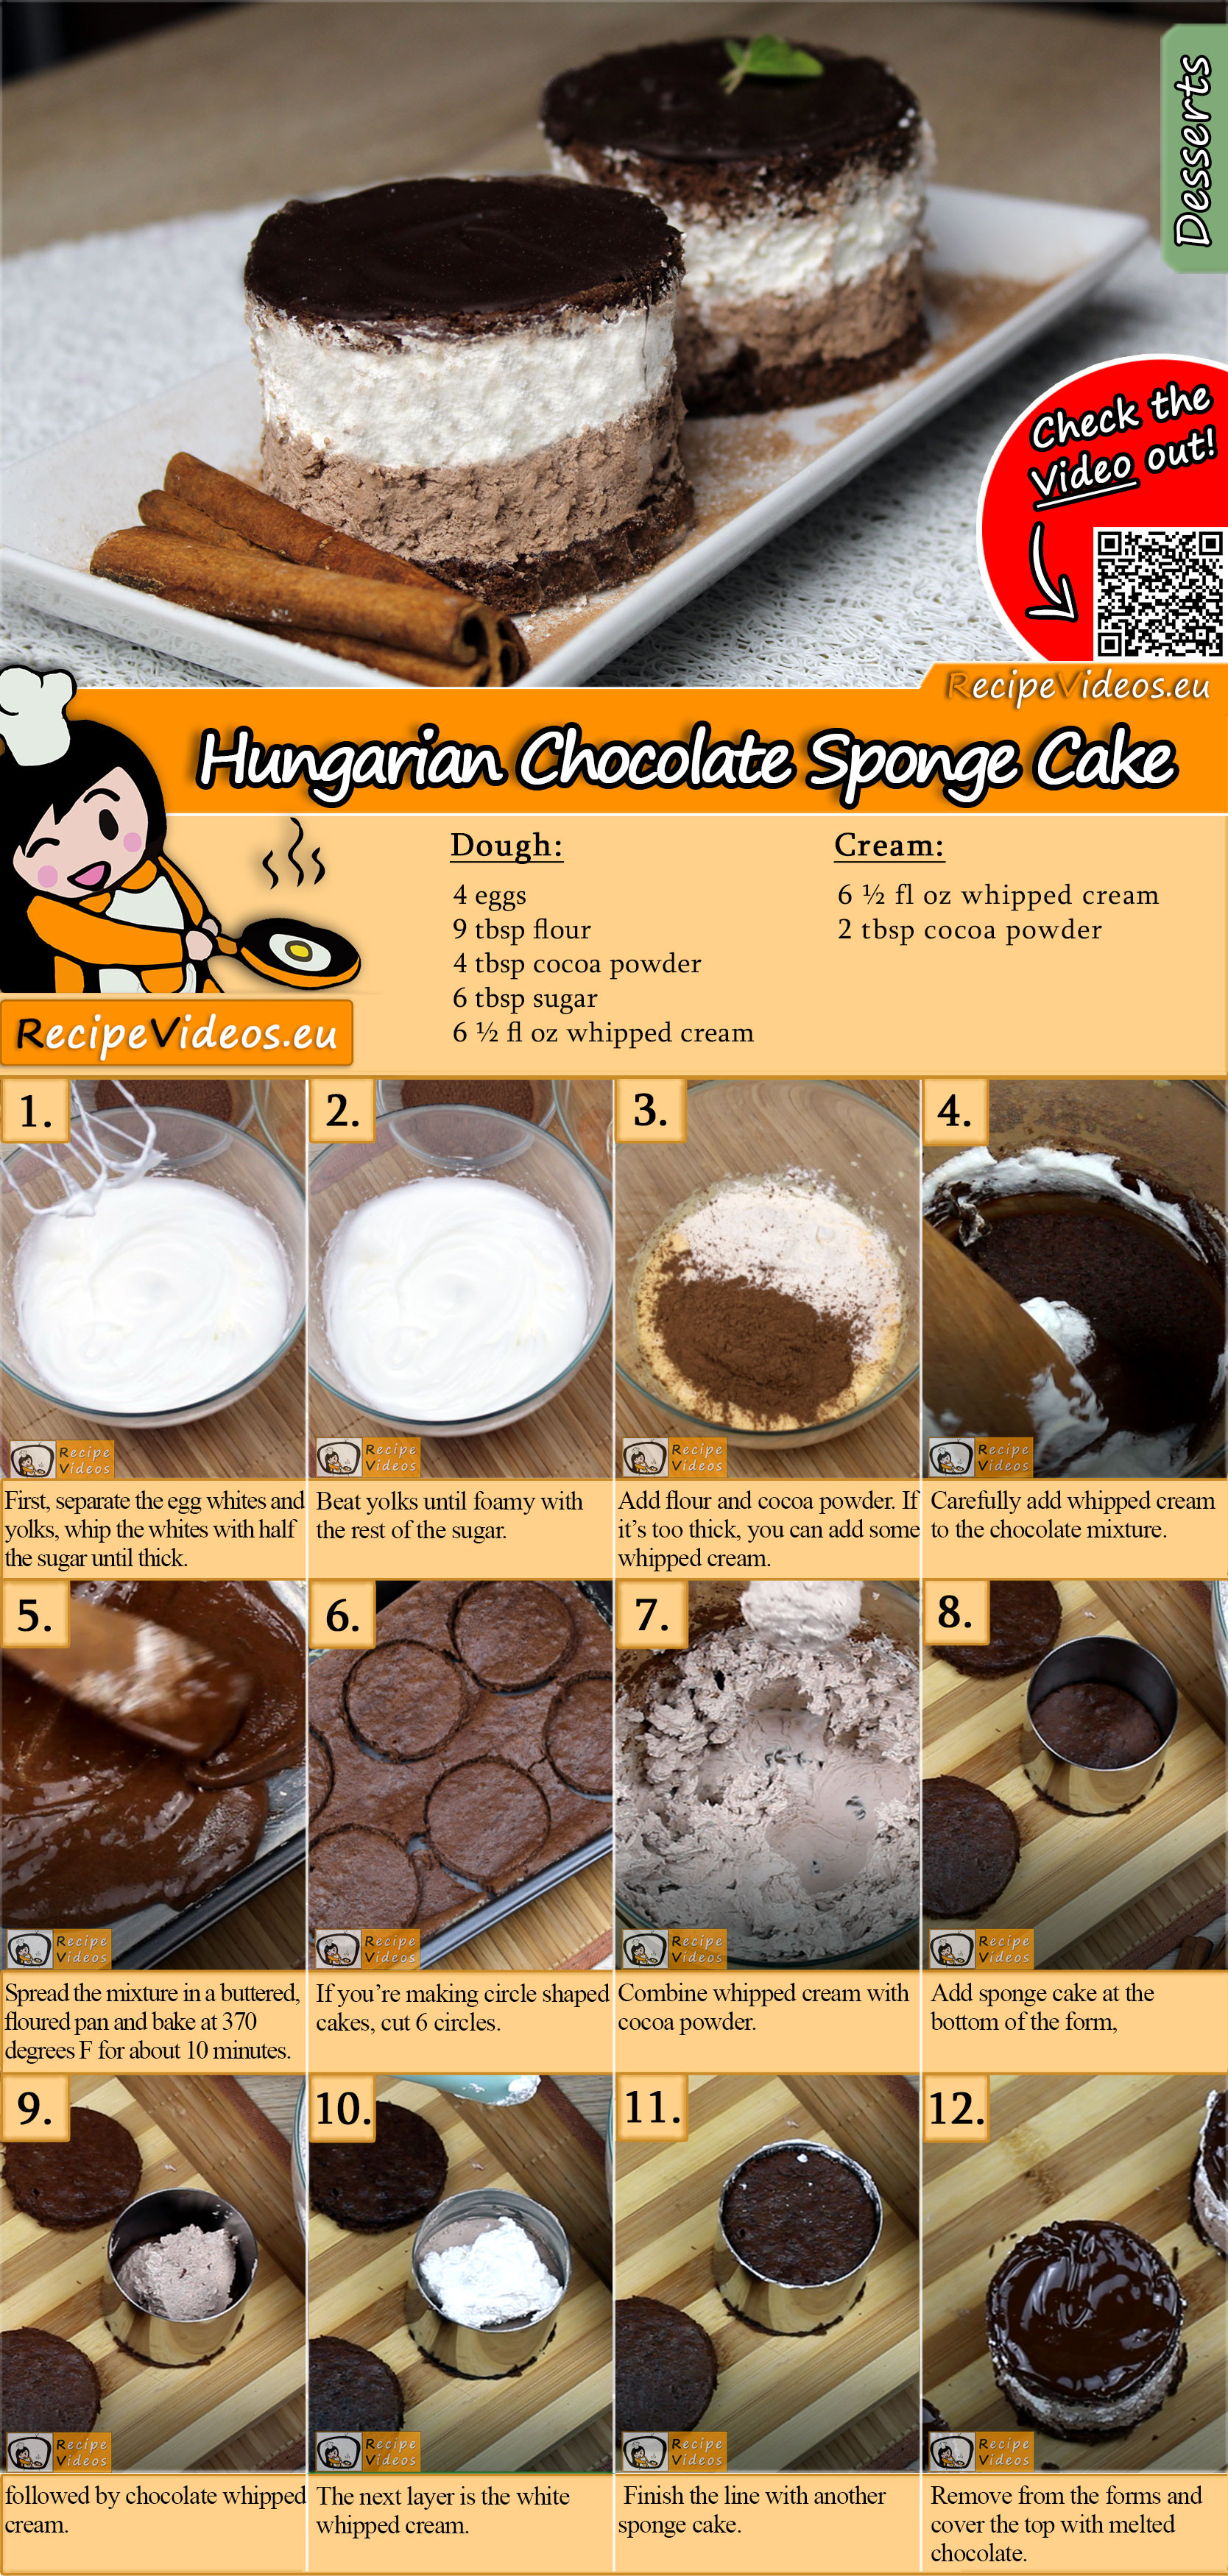 Rigó Jancsi – Hungarian Chocolate Sponge Cake recipe with video